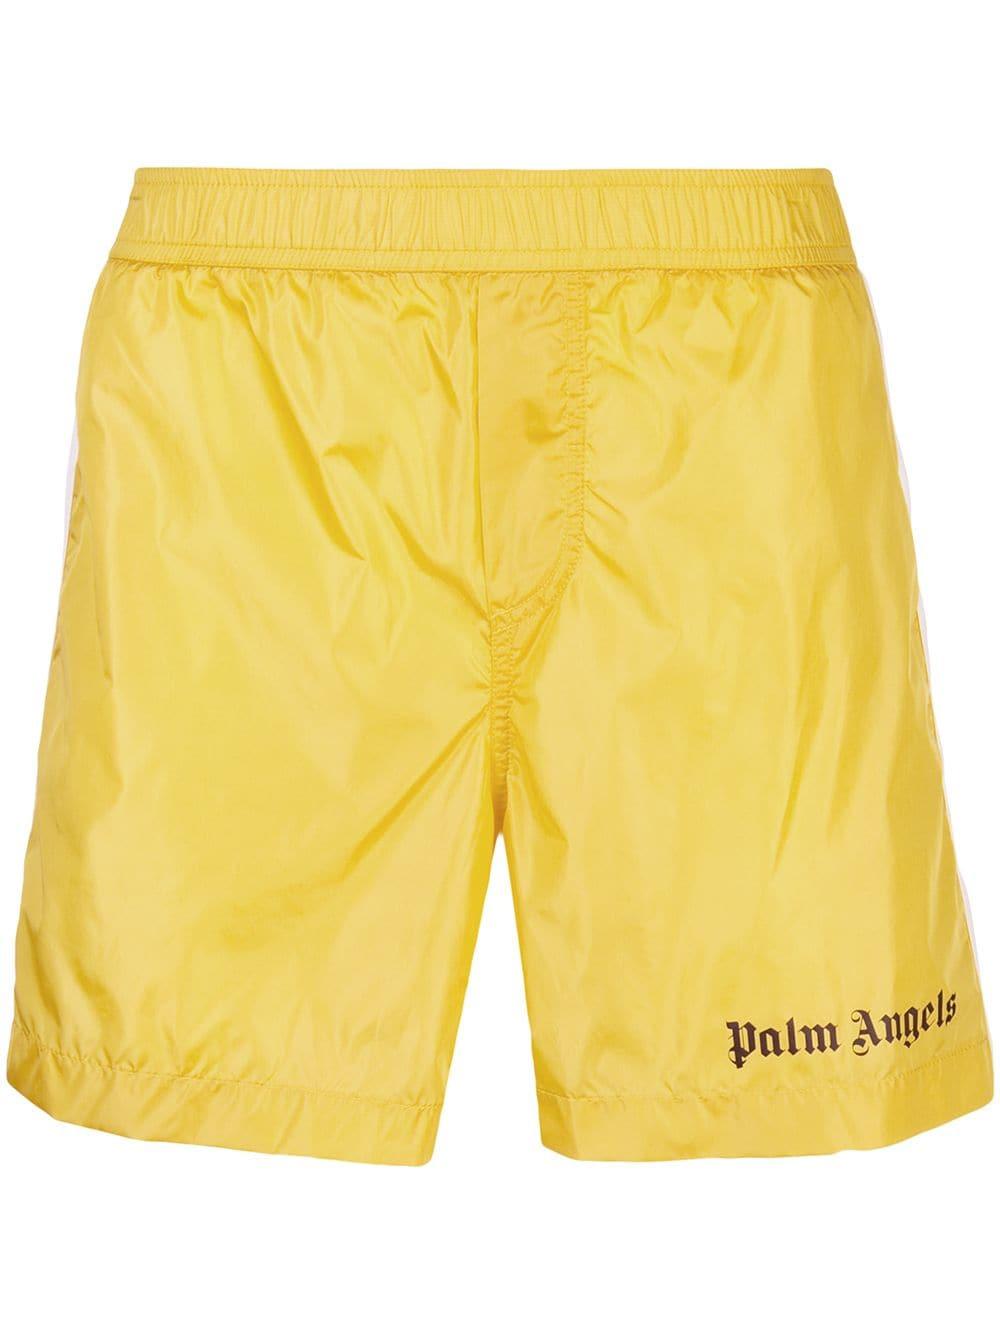 a18ba7142b PALM ANGELS PALM ANGELS TRACK BOARD SHORTS - YELLOW. #palmangels #cloth